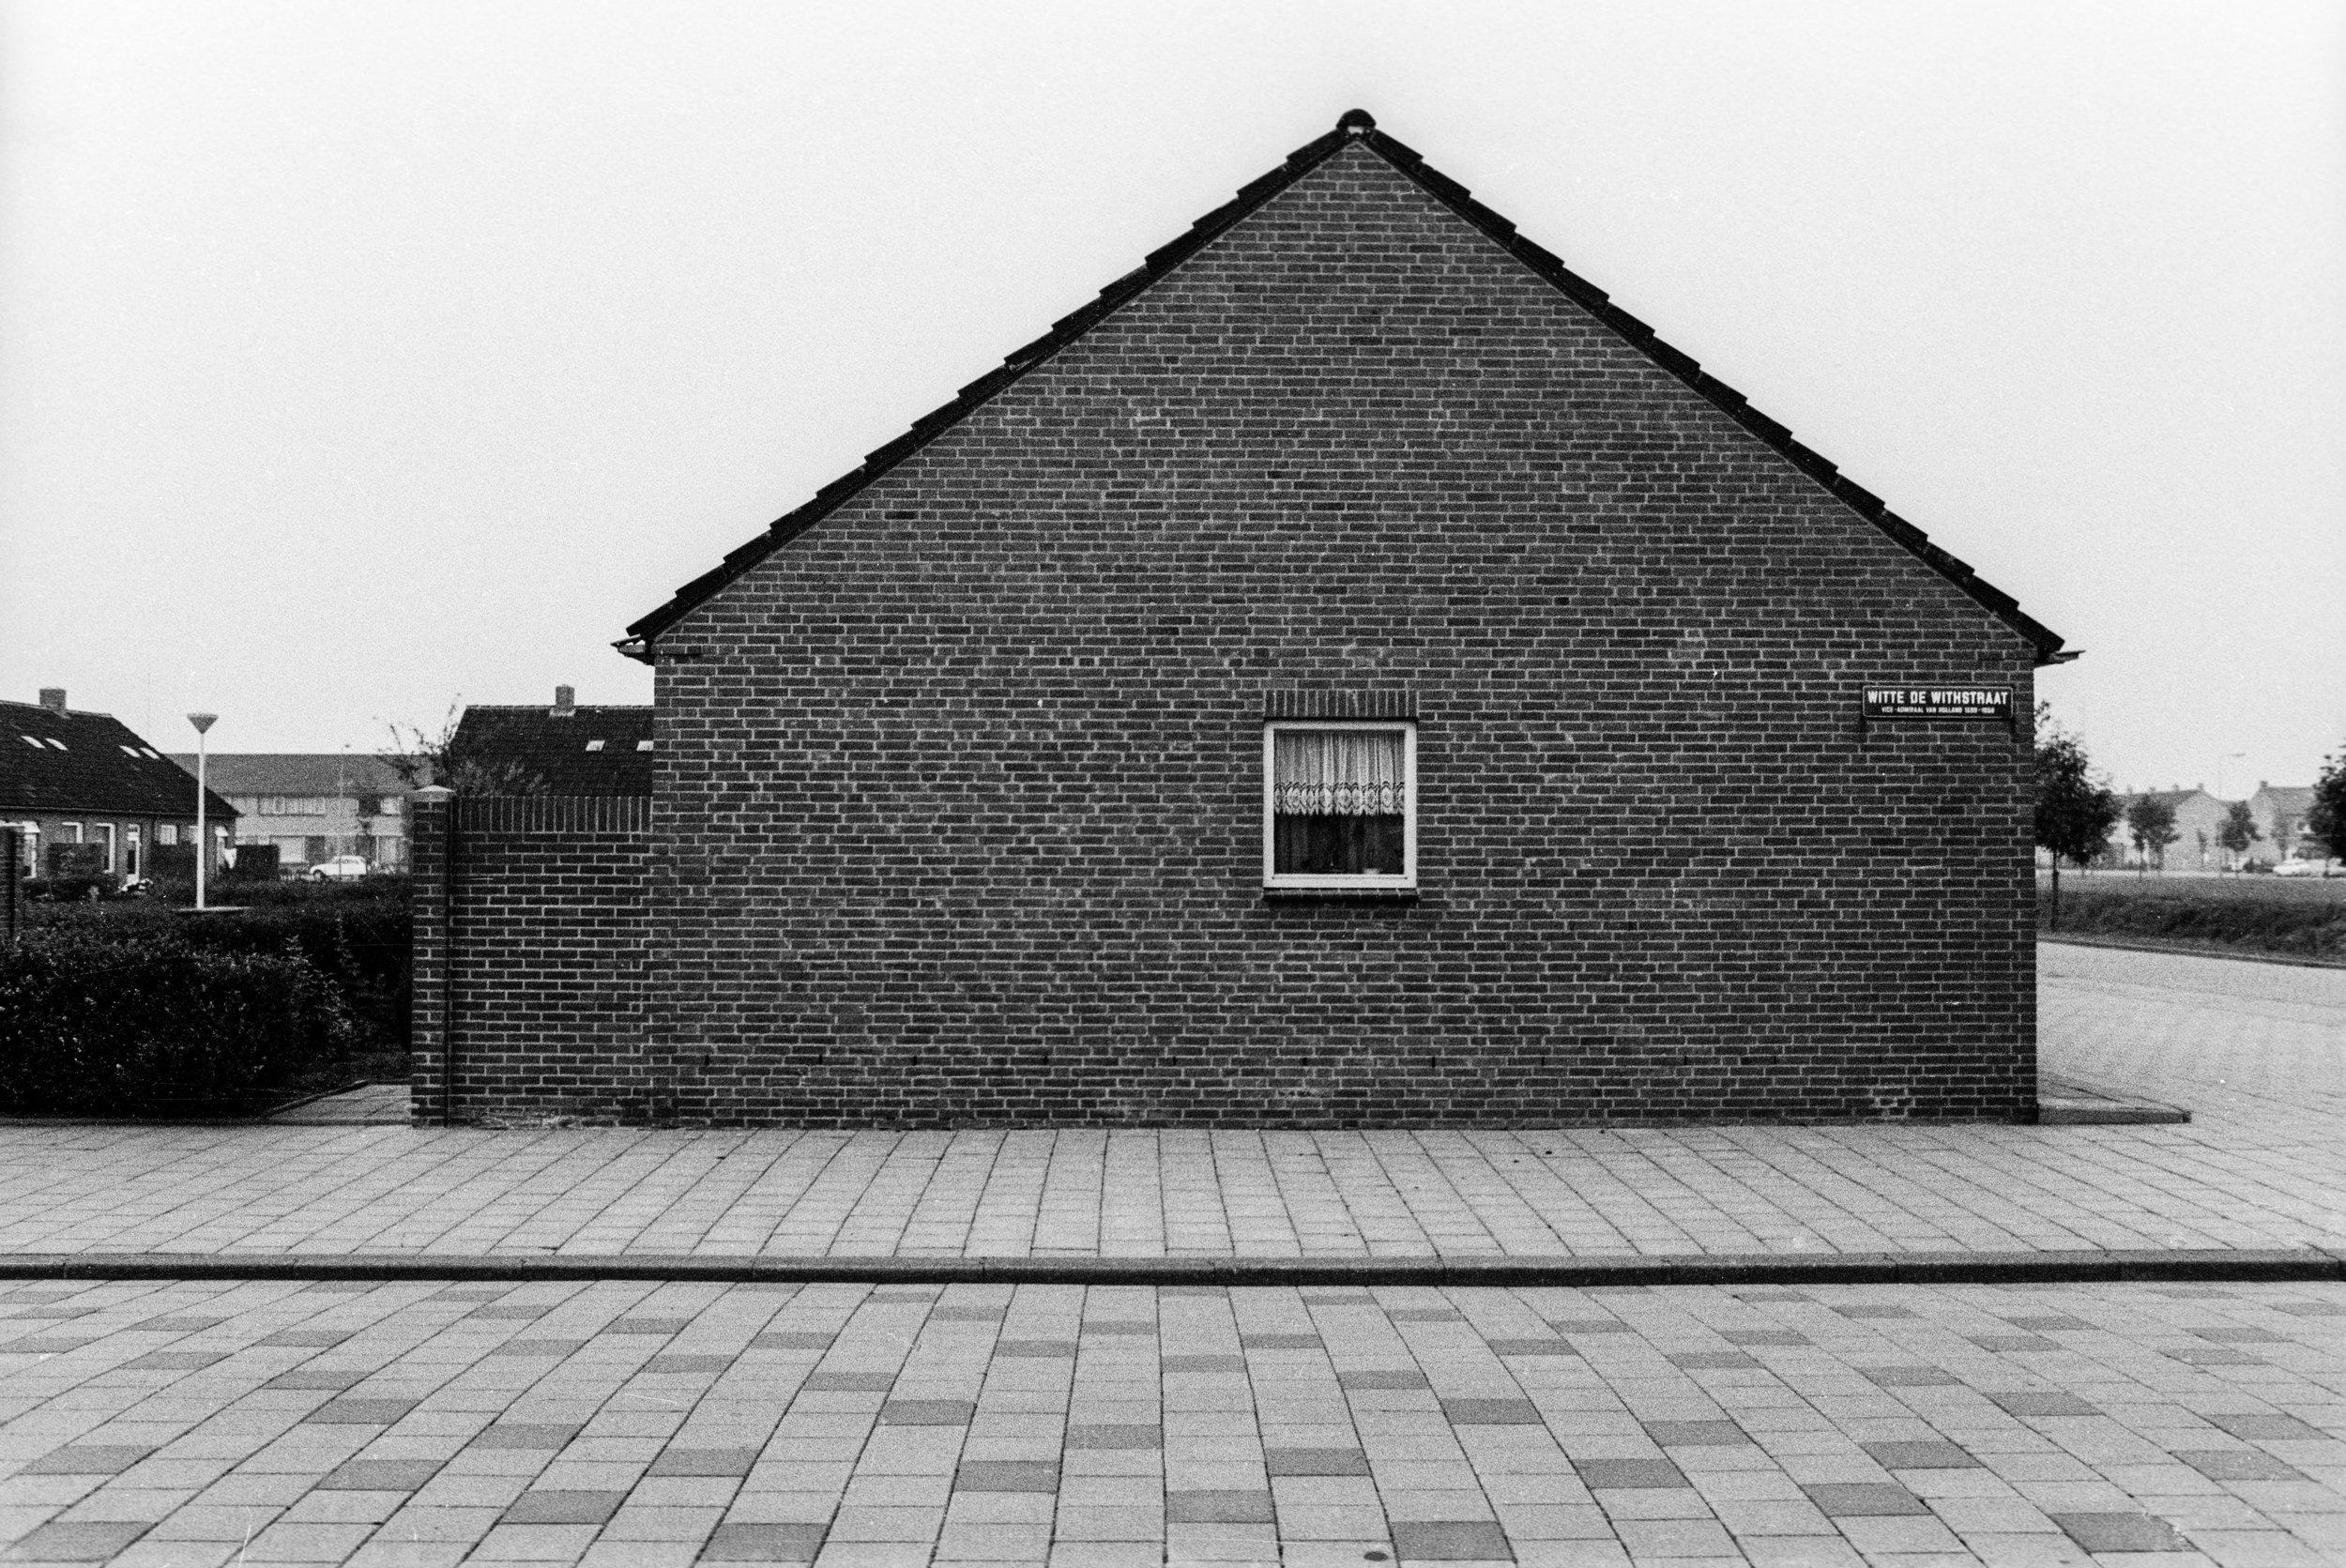 Rotterdam, Netherlands 1971